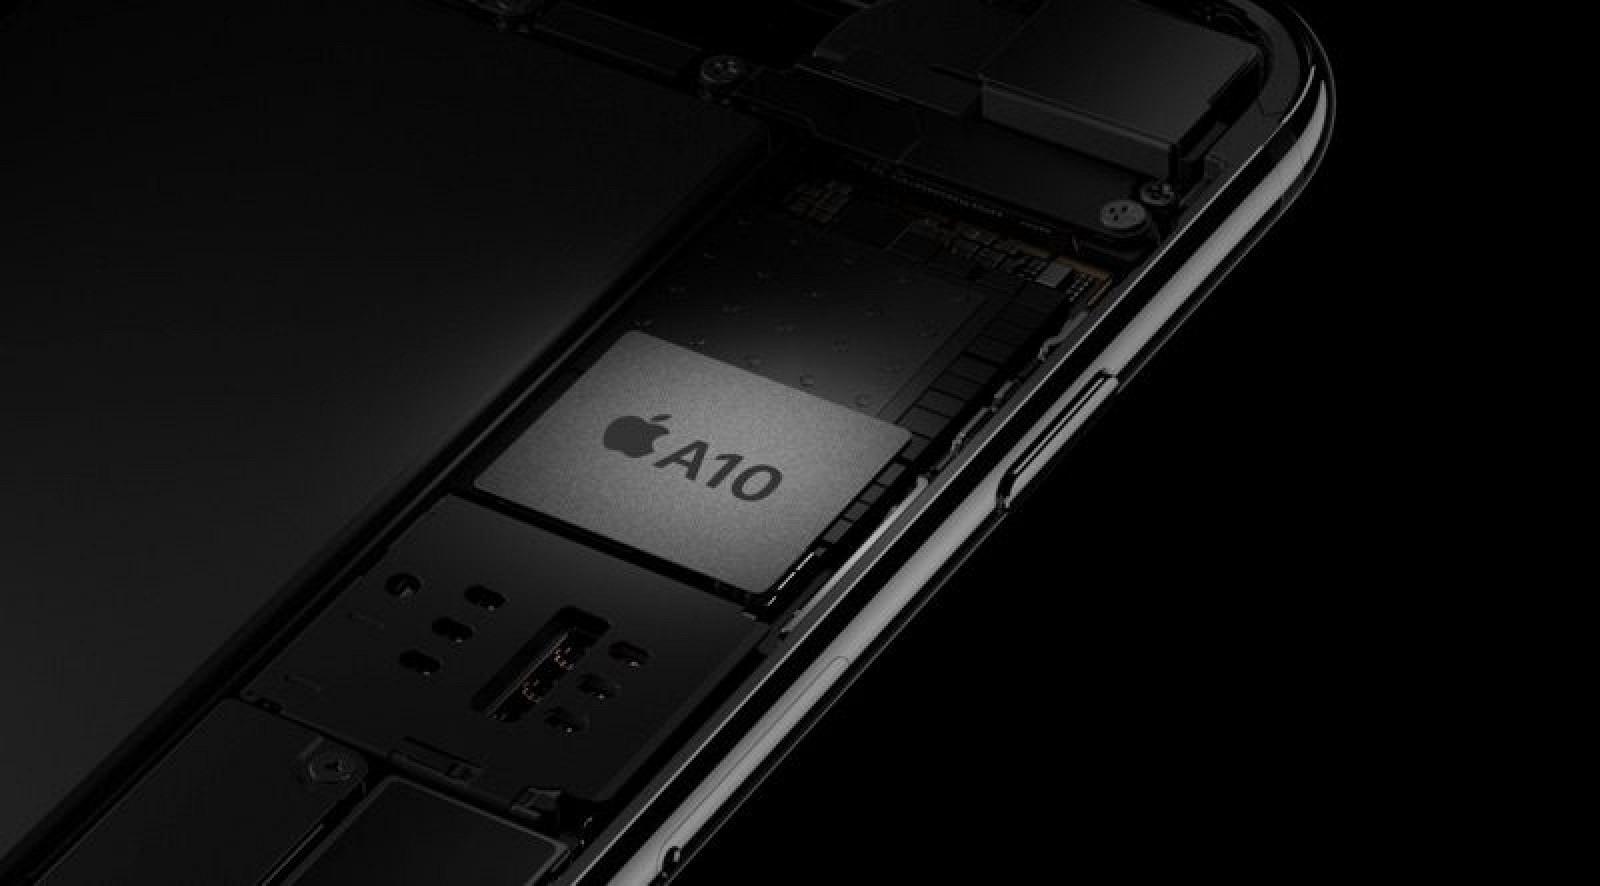 applea10fusionprocessor-800x443